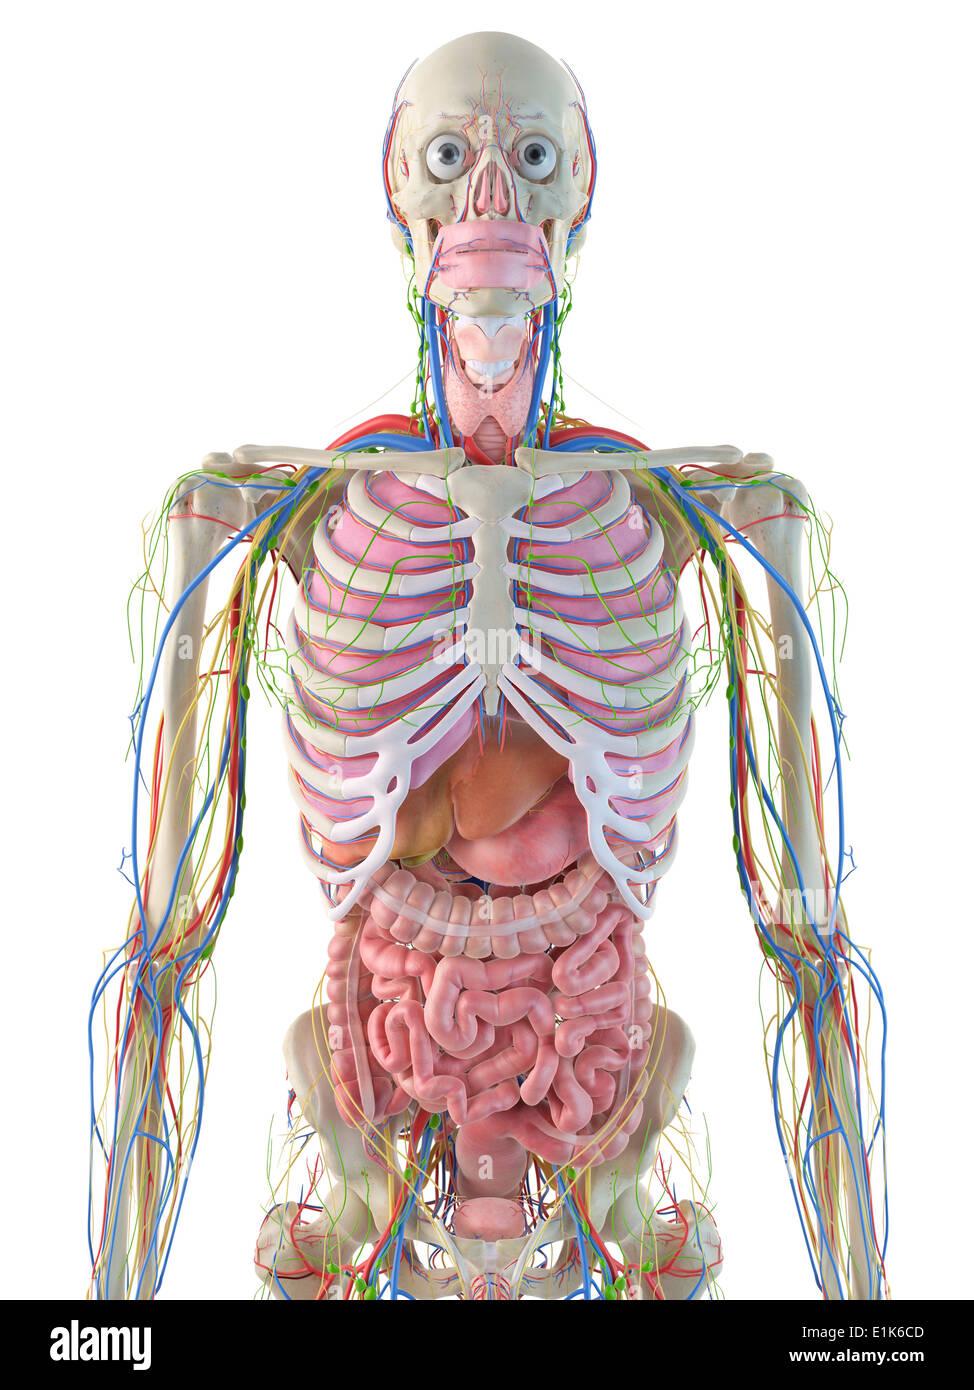 Human digestive ribcage computer artwork stock photos human human digestive system computer artwork stock image ccuart Gallery